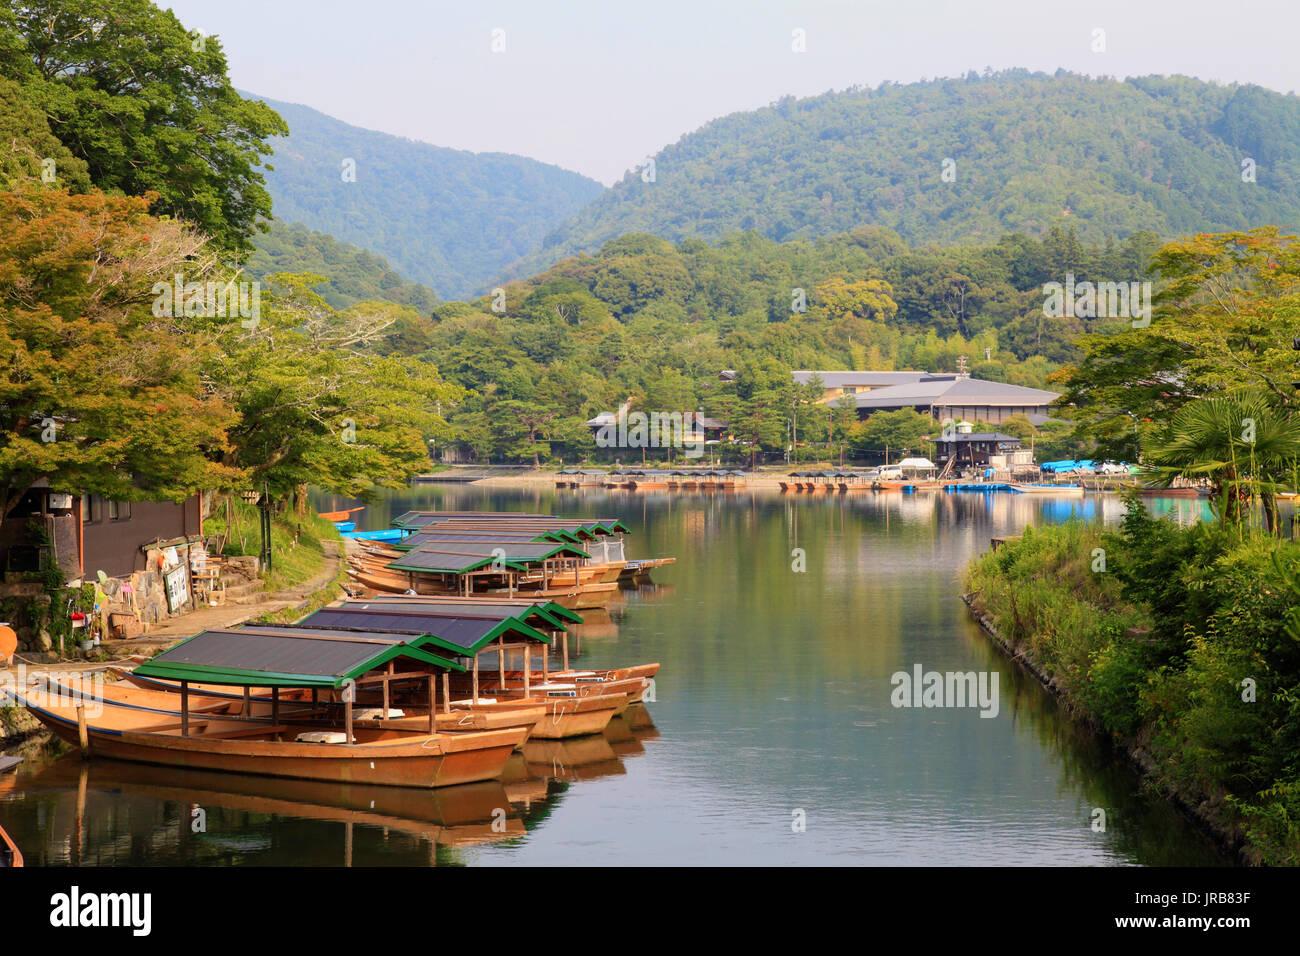 Japan, Kyoto, Arashiyama, Hozu river, boats, - Stock Image